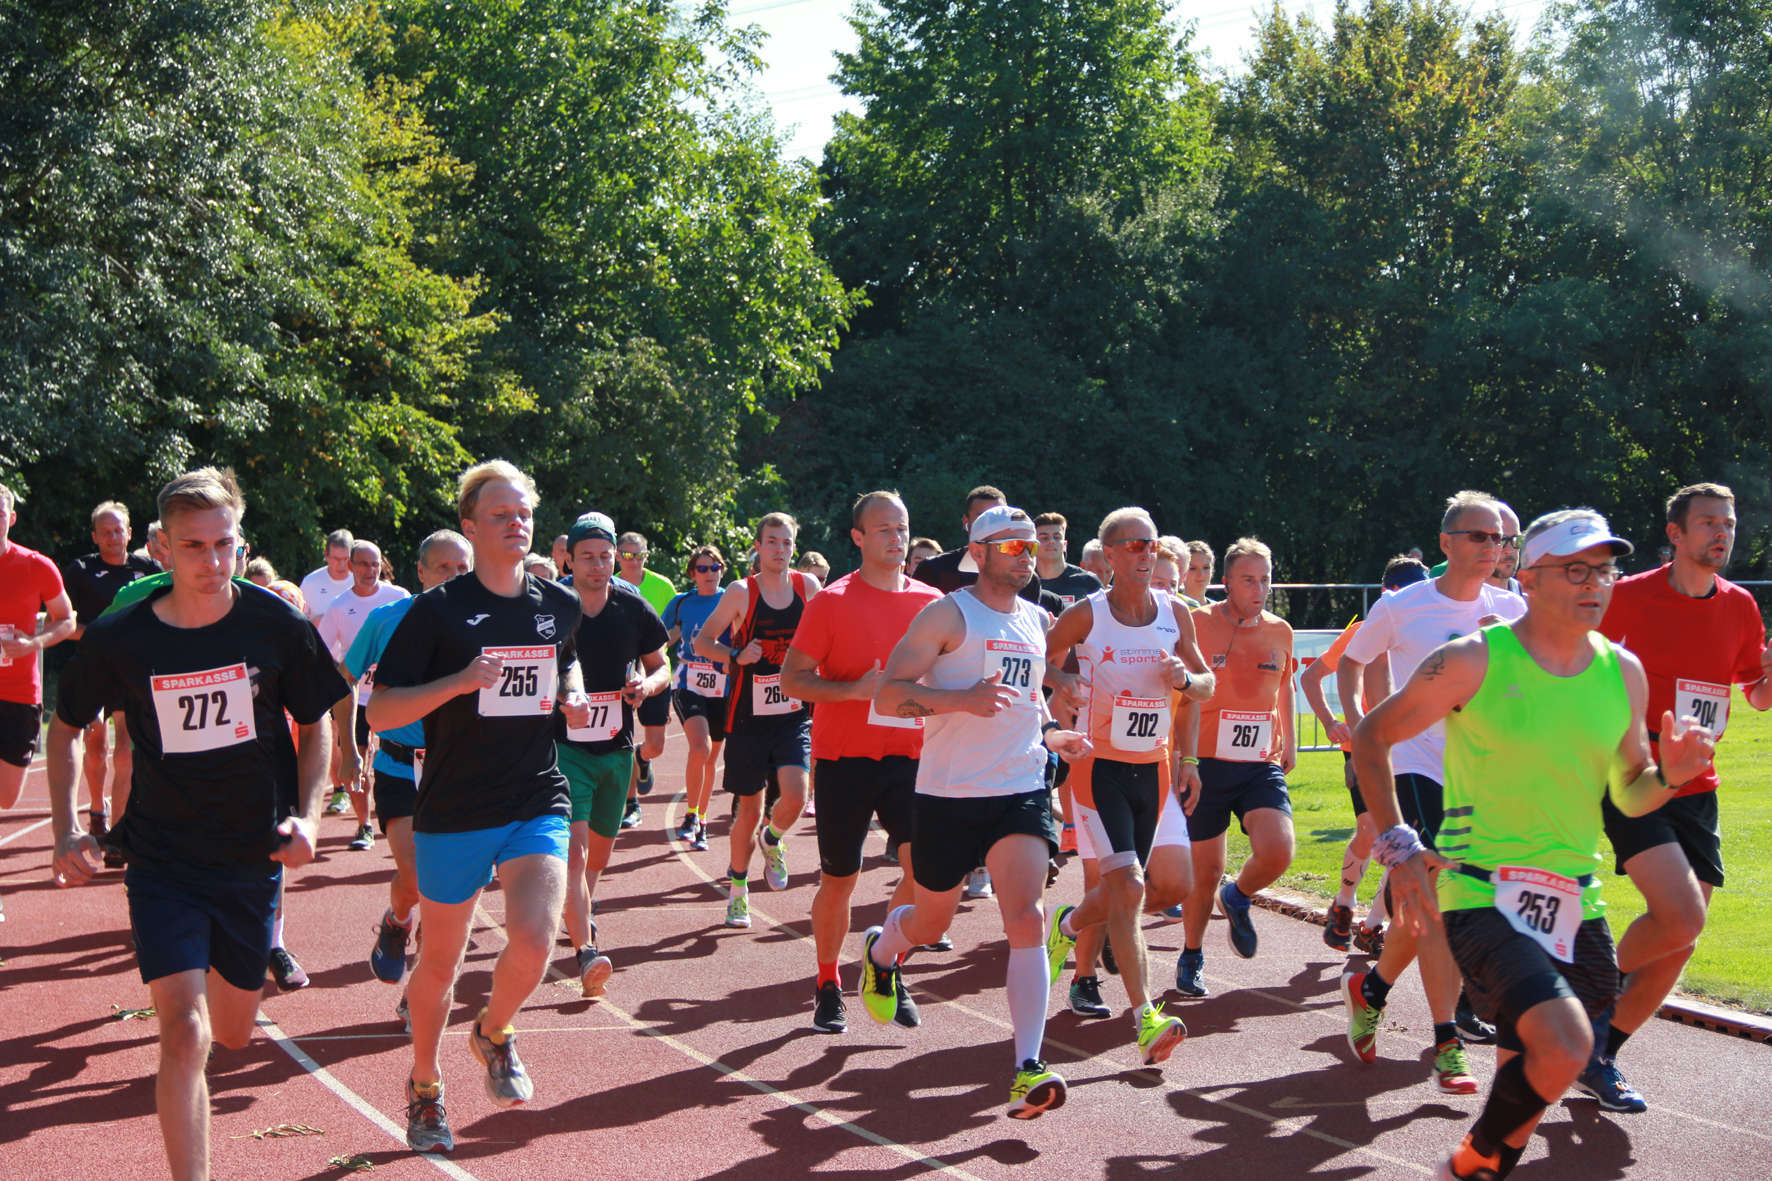 Volkslauf-_-2019-_-05-_-Start-10-km-_-11